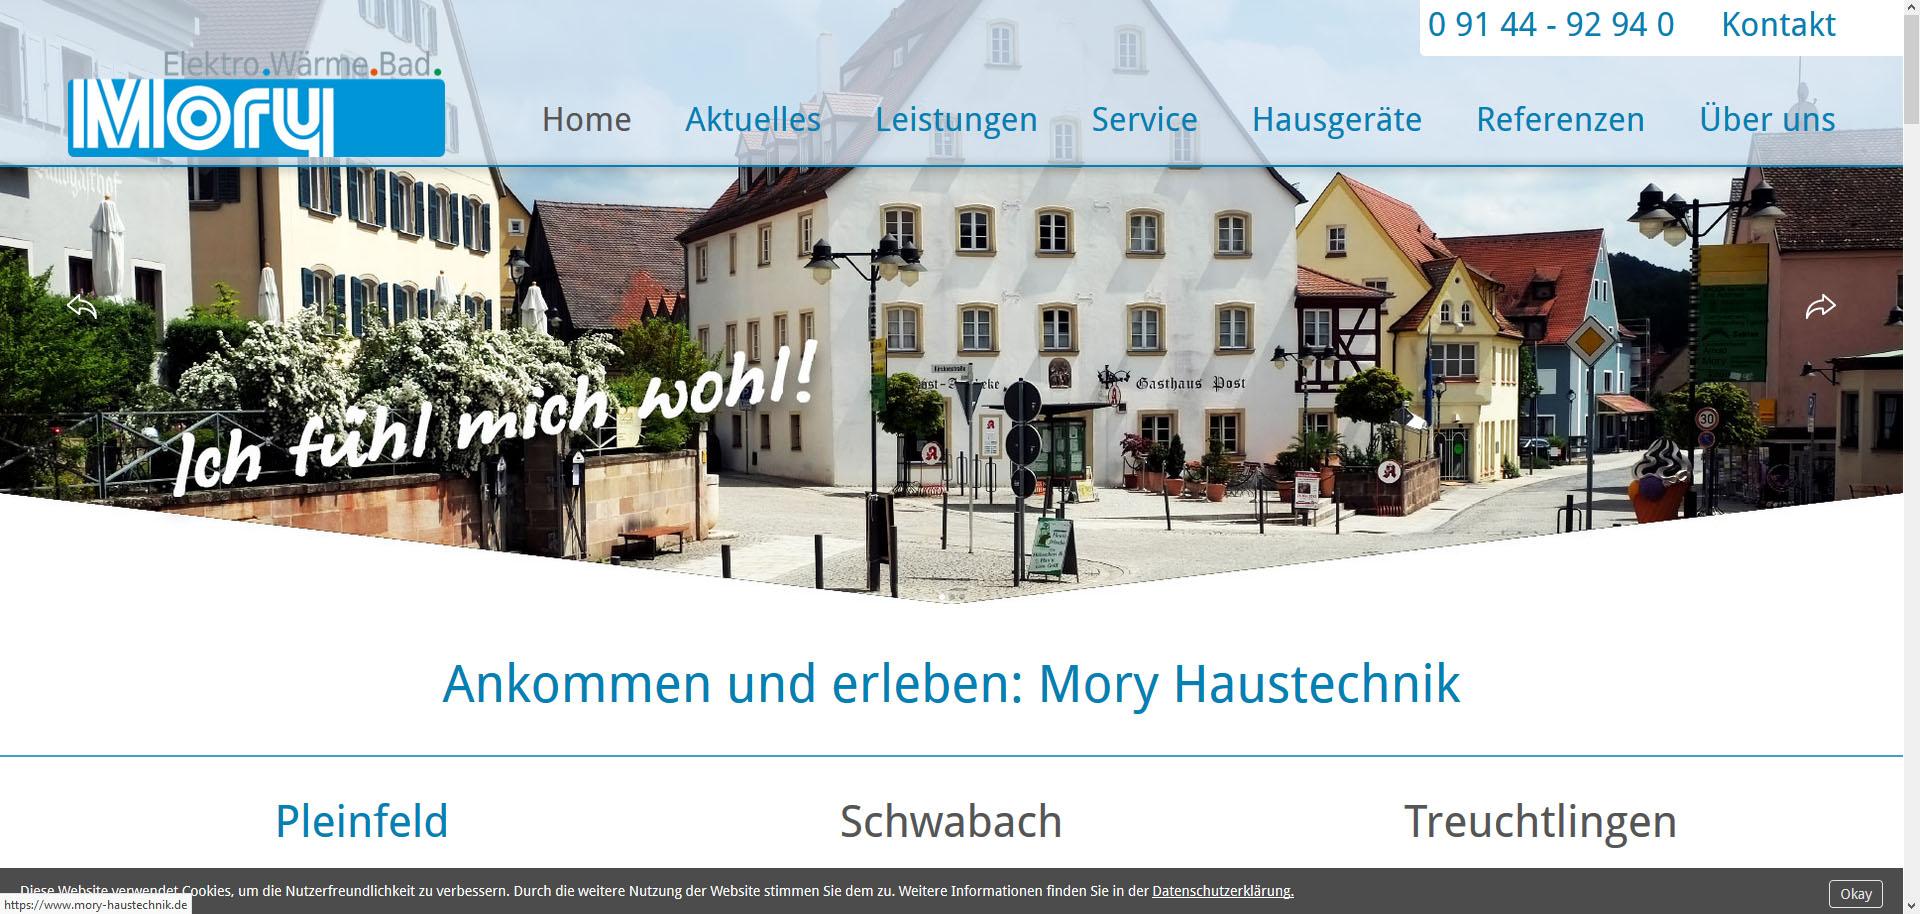 MORY Haustechnik GmbH & Co. KG